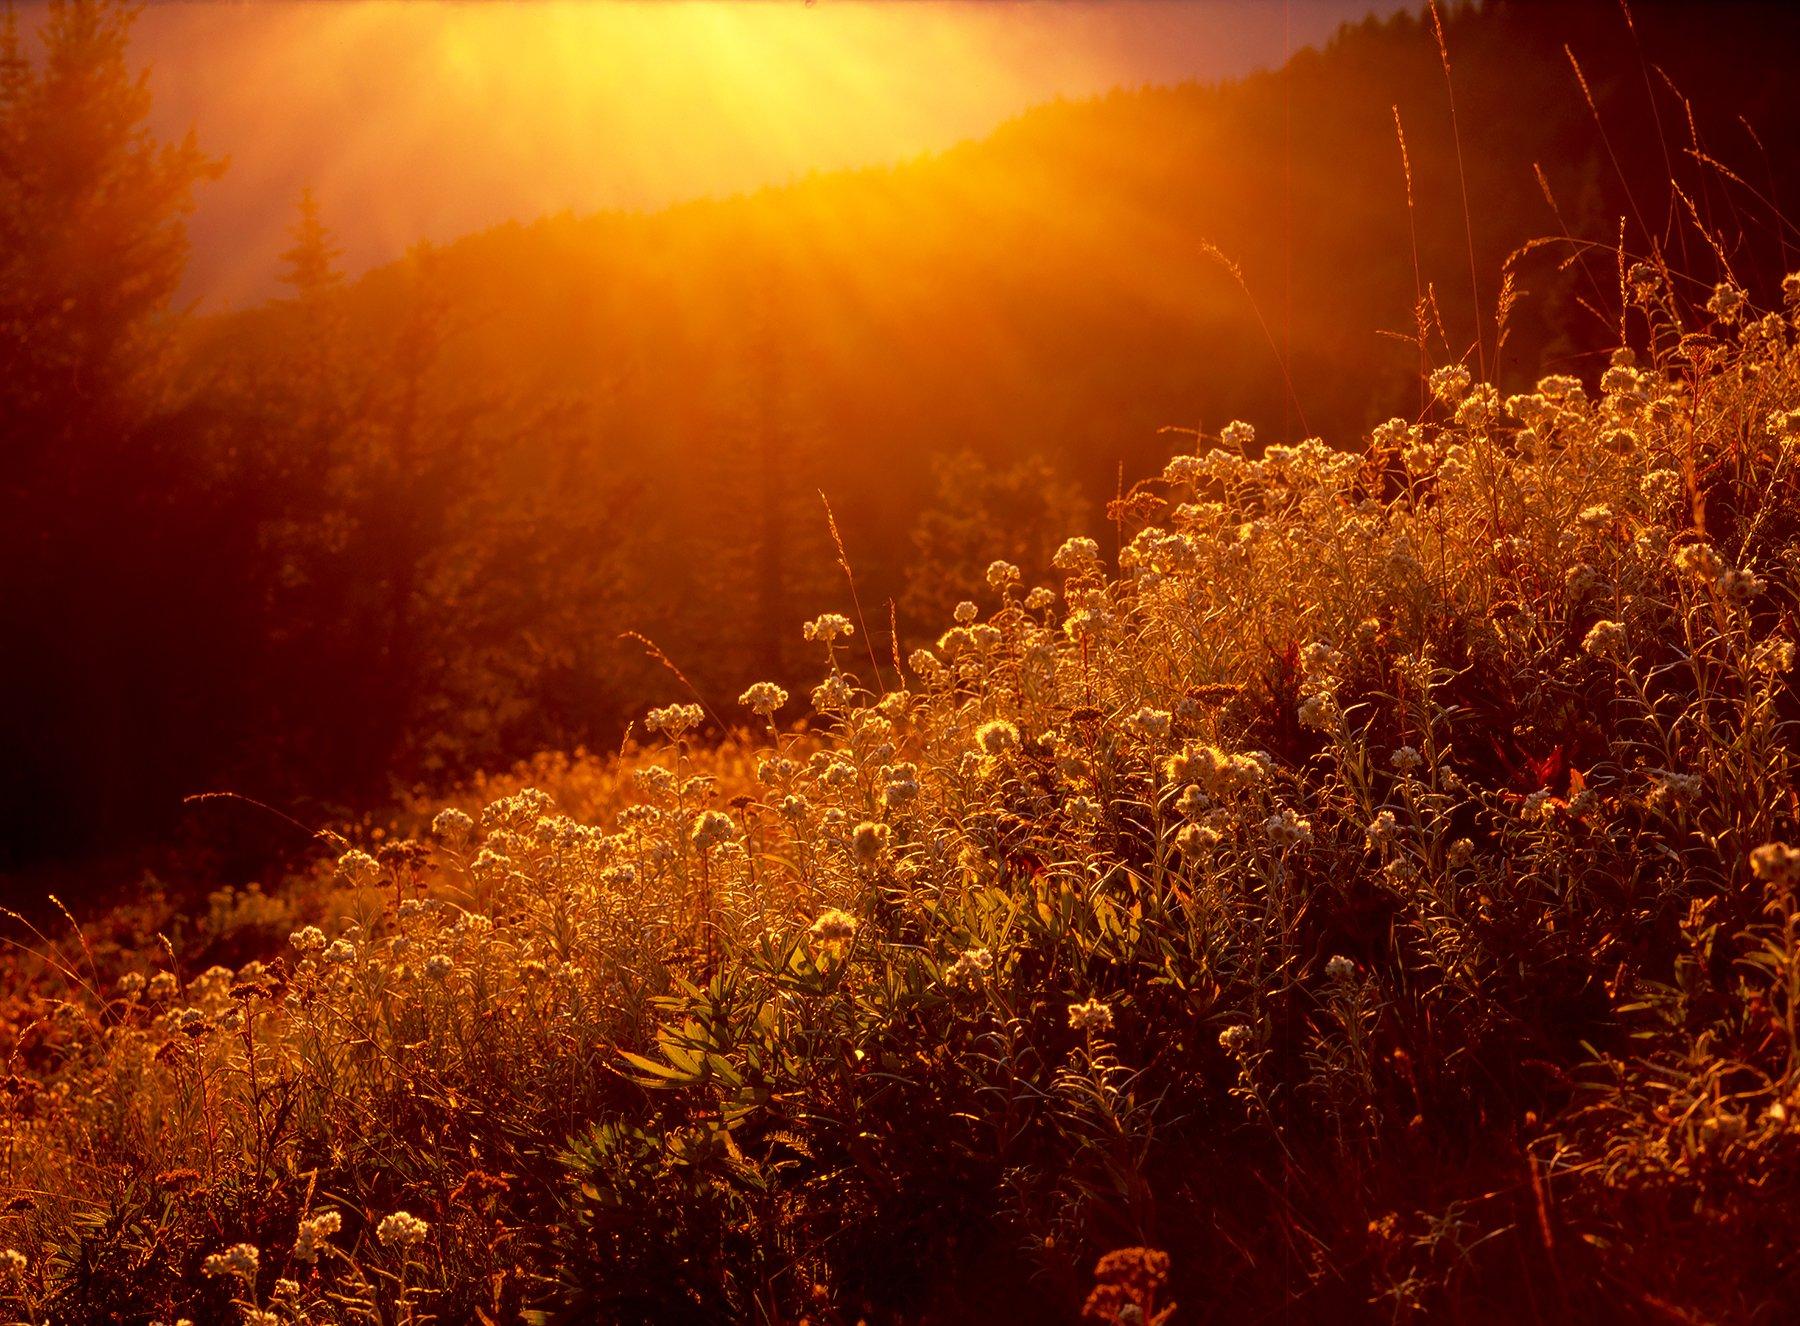 Golden Hour on Hurricane Ridge, Olympic National Park, Washington (2017)